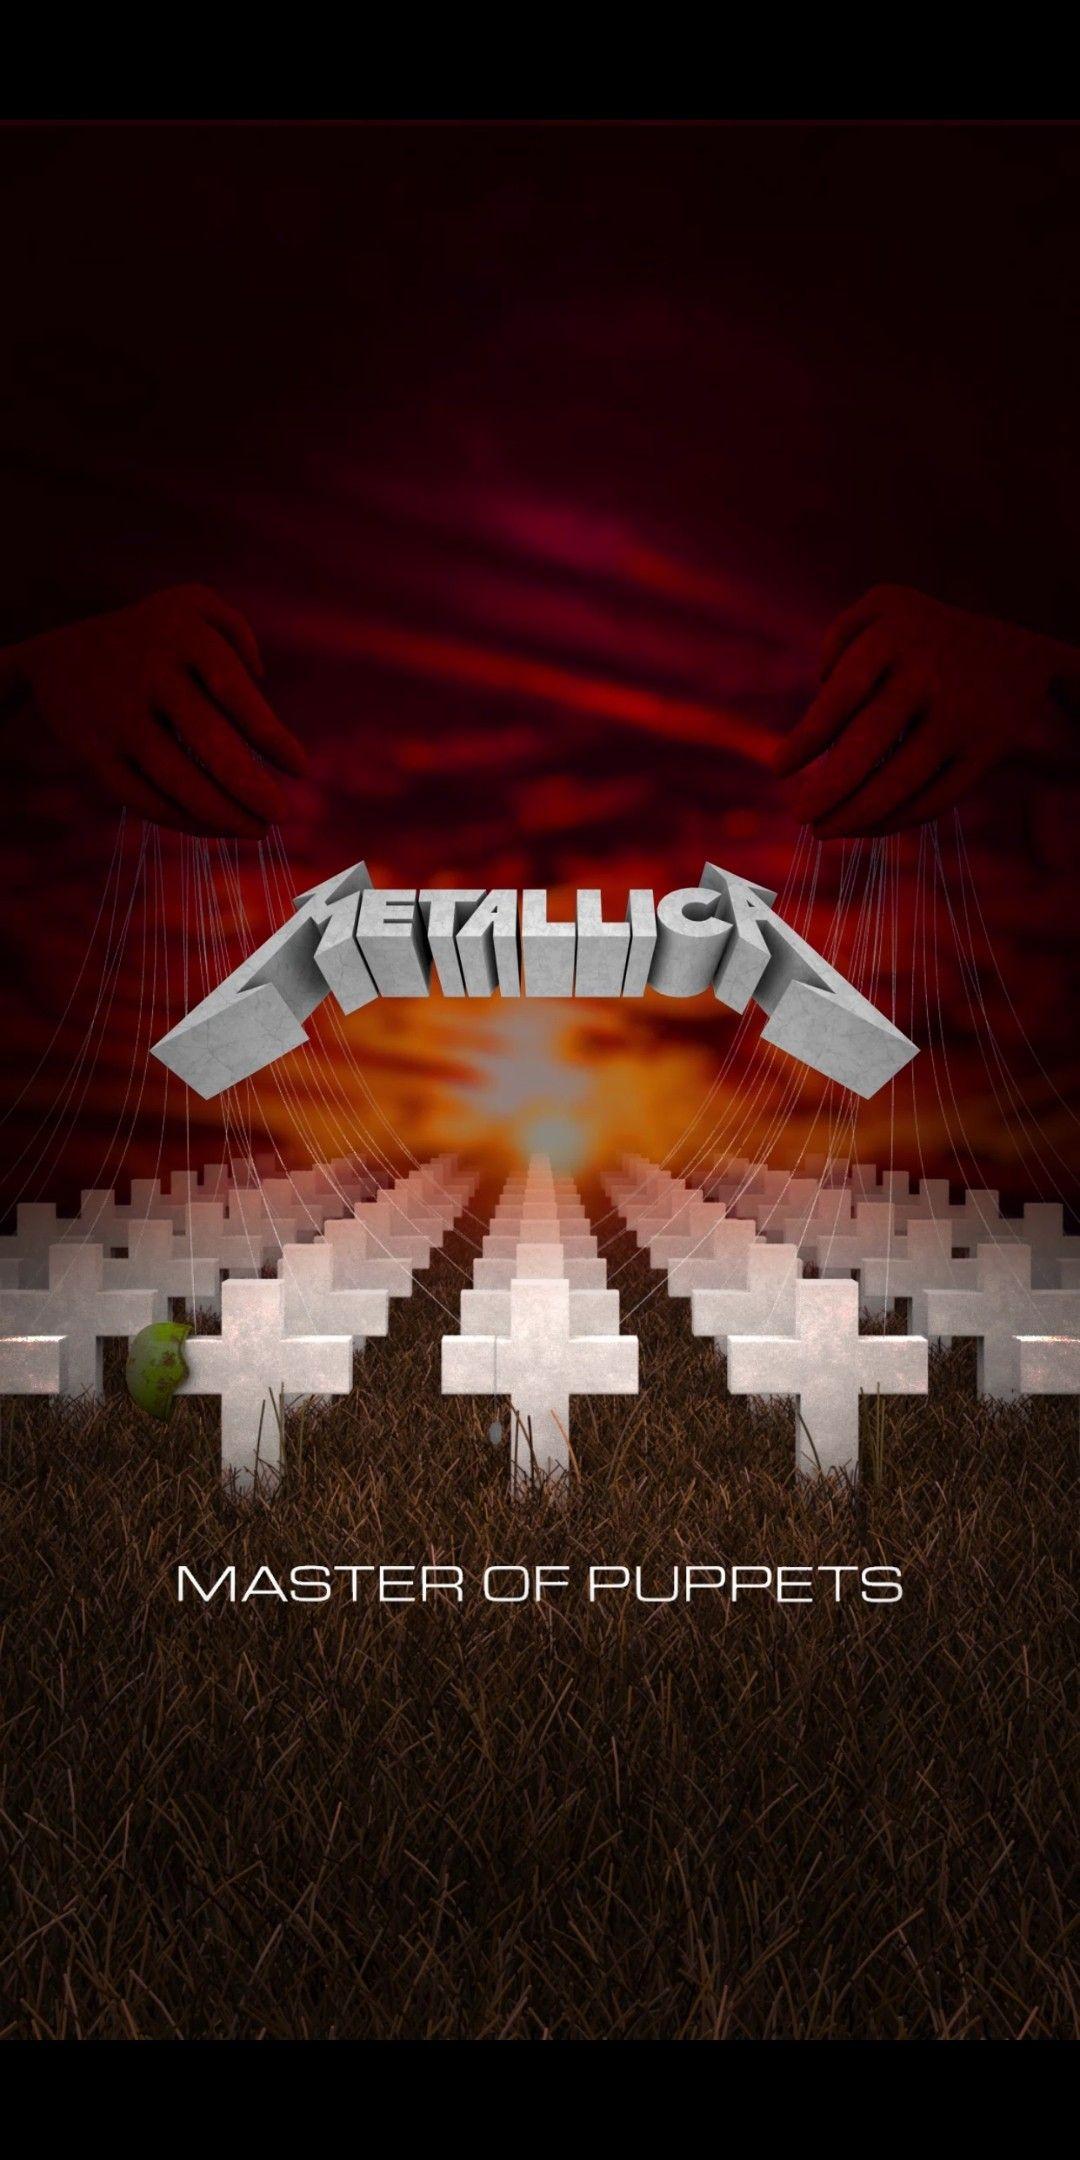 Metallica Master Of Puppets Wallpaper Iphone Metallica Album